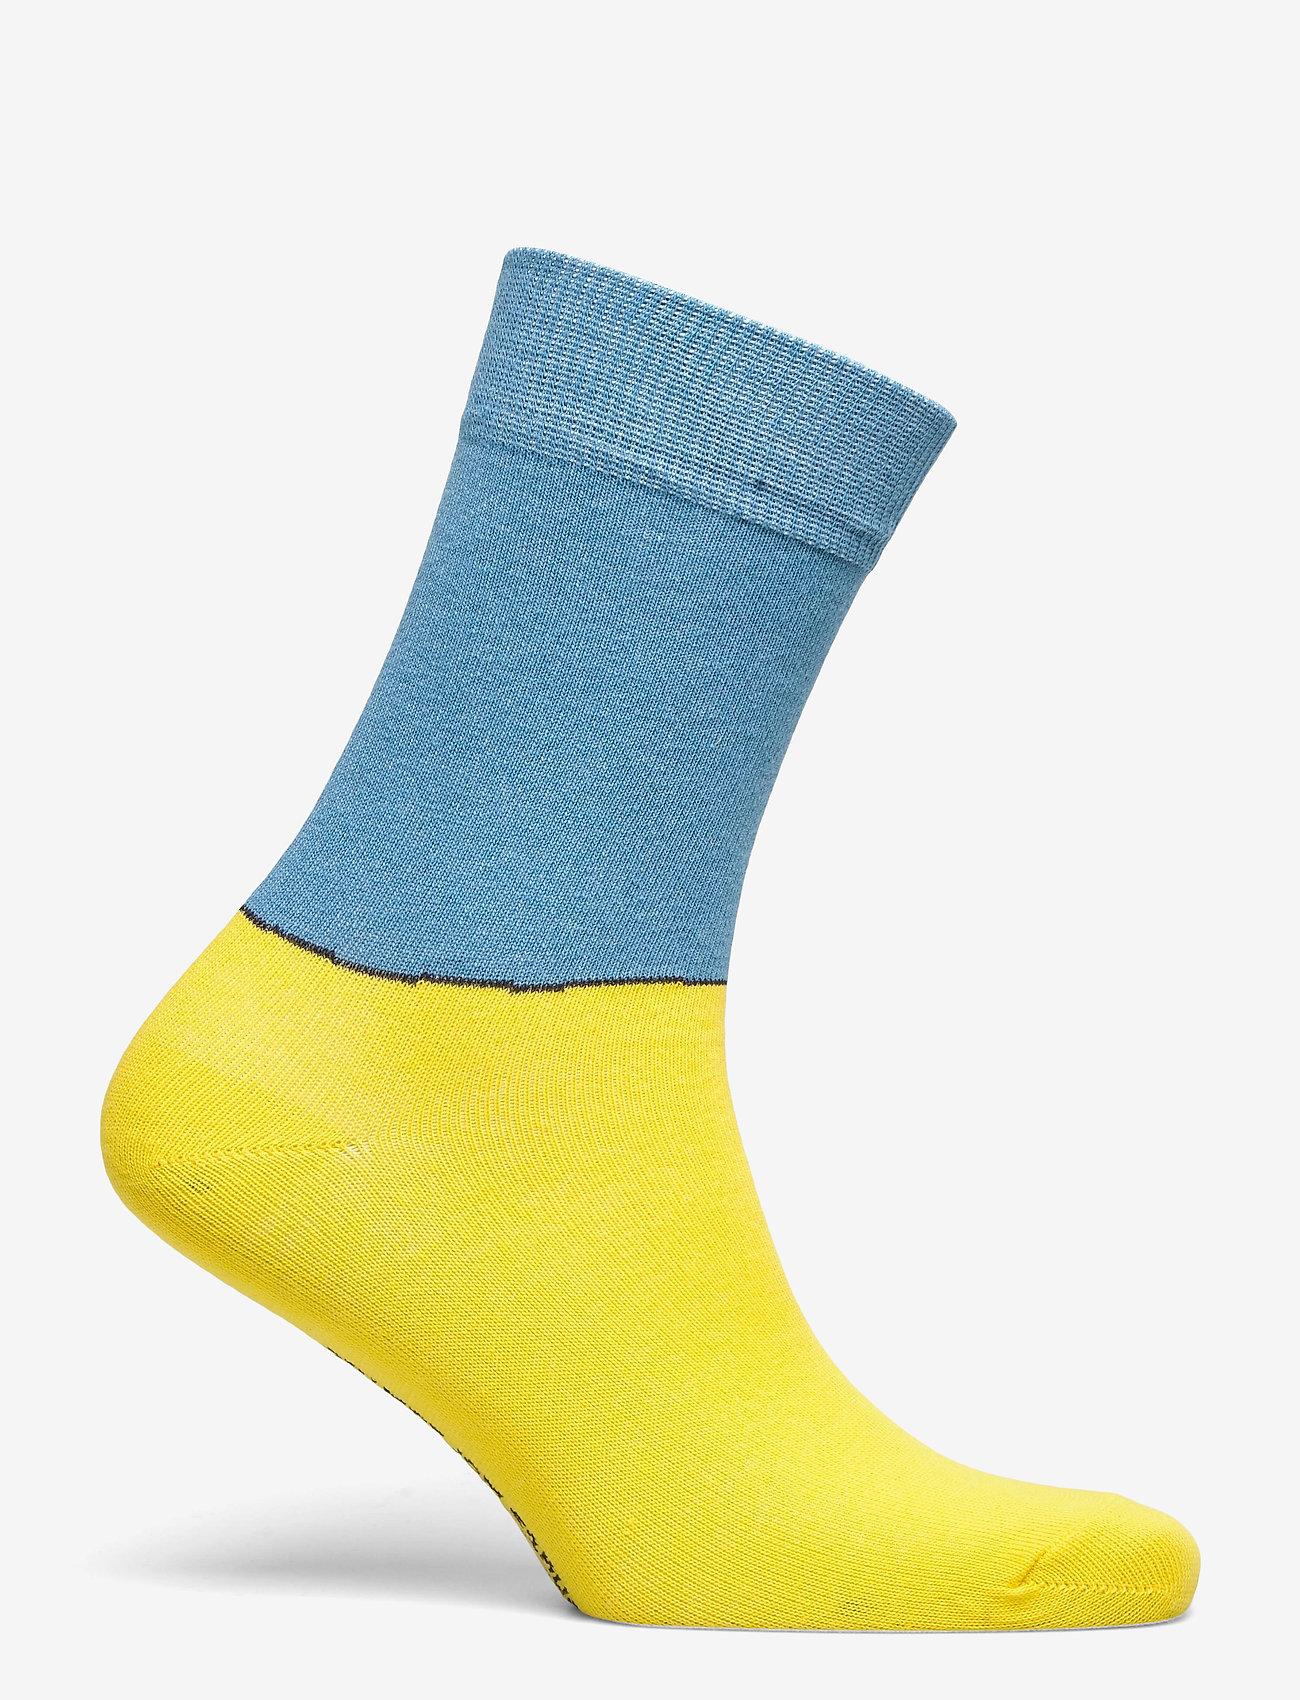 DEDICATED - Socks Sigtuna Peanuts 5-pack - chaussettes régulières - multi - 2